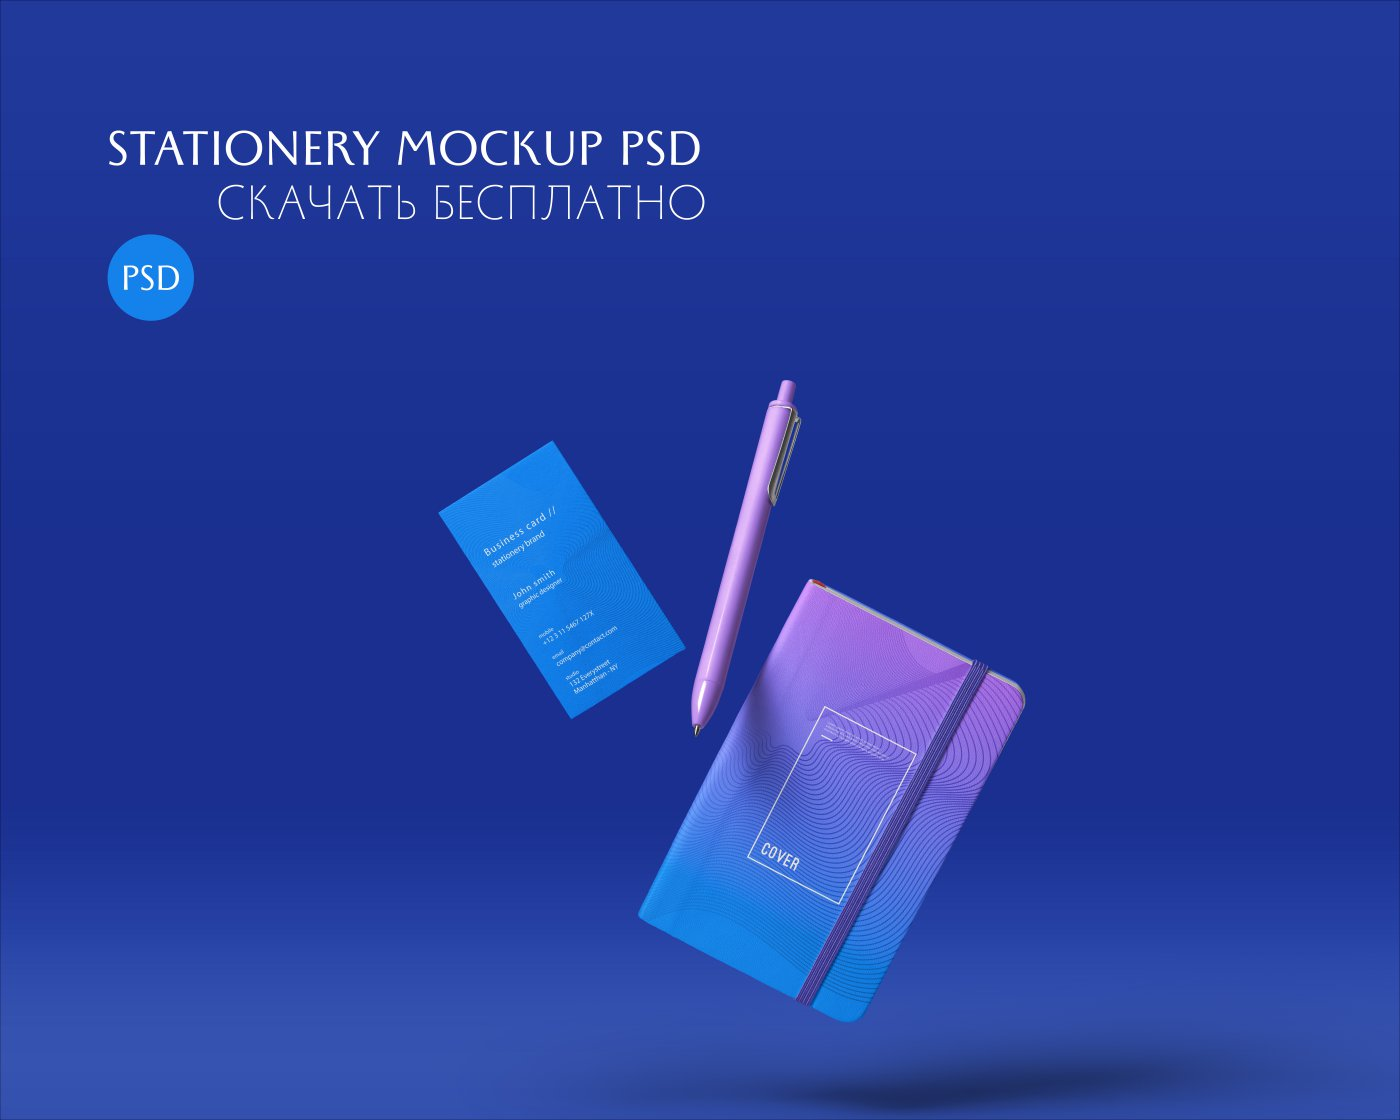 PSD Stationery Mockup Free